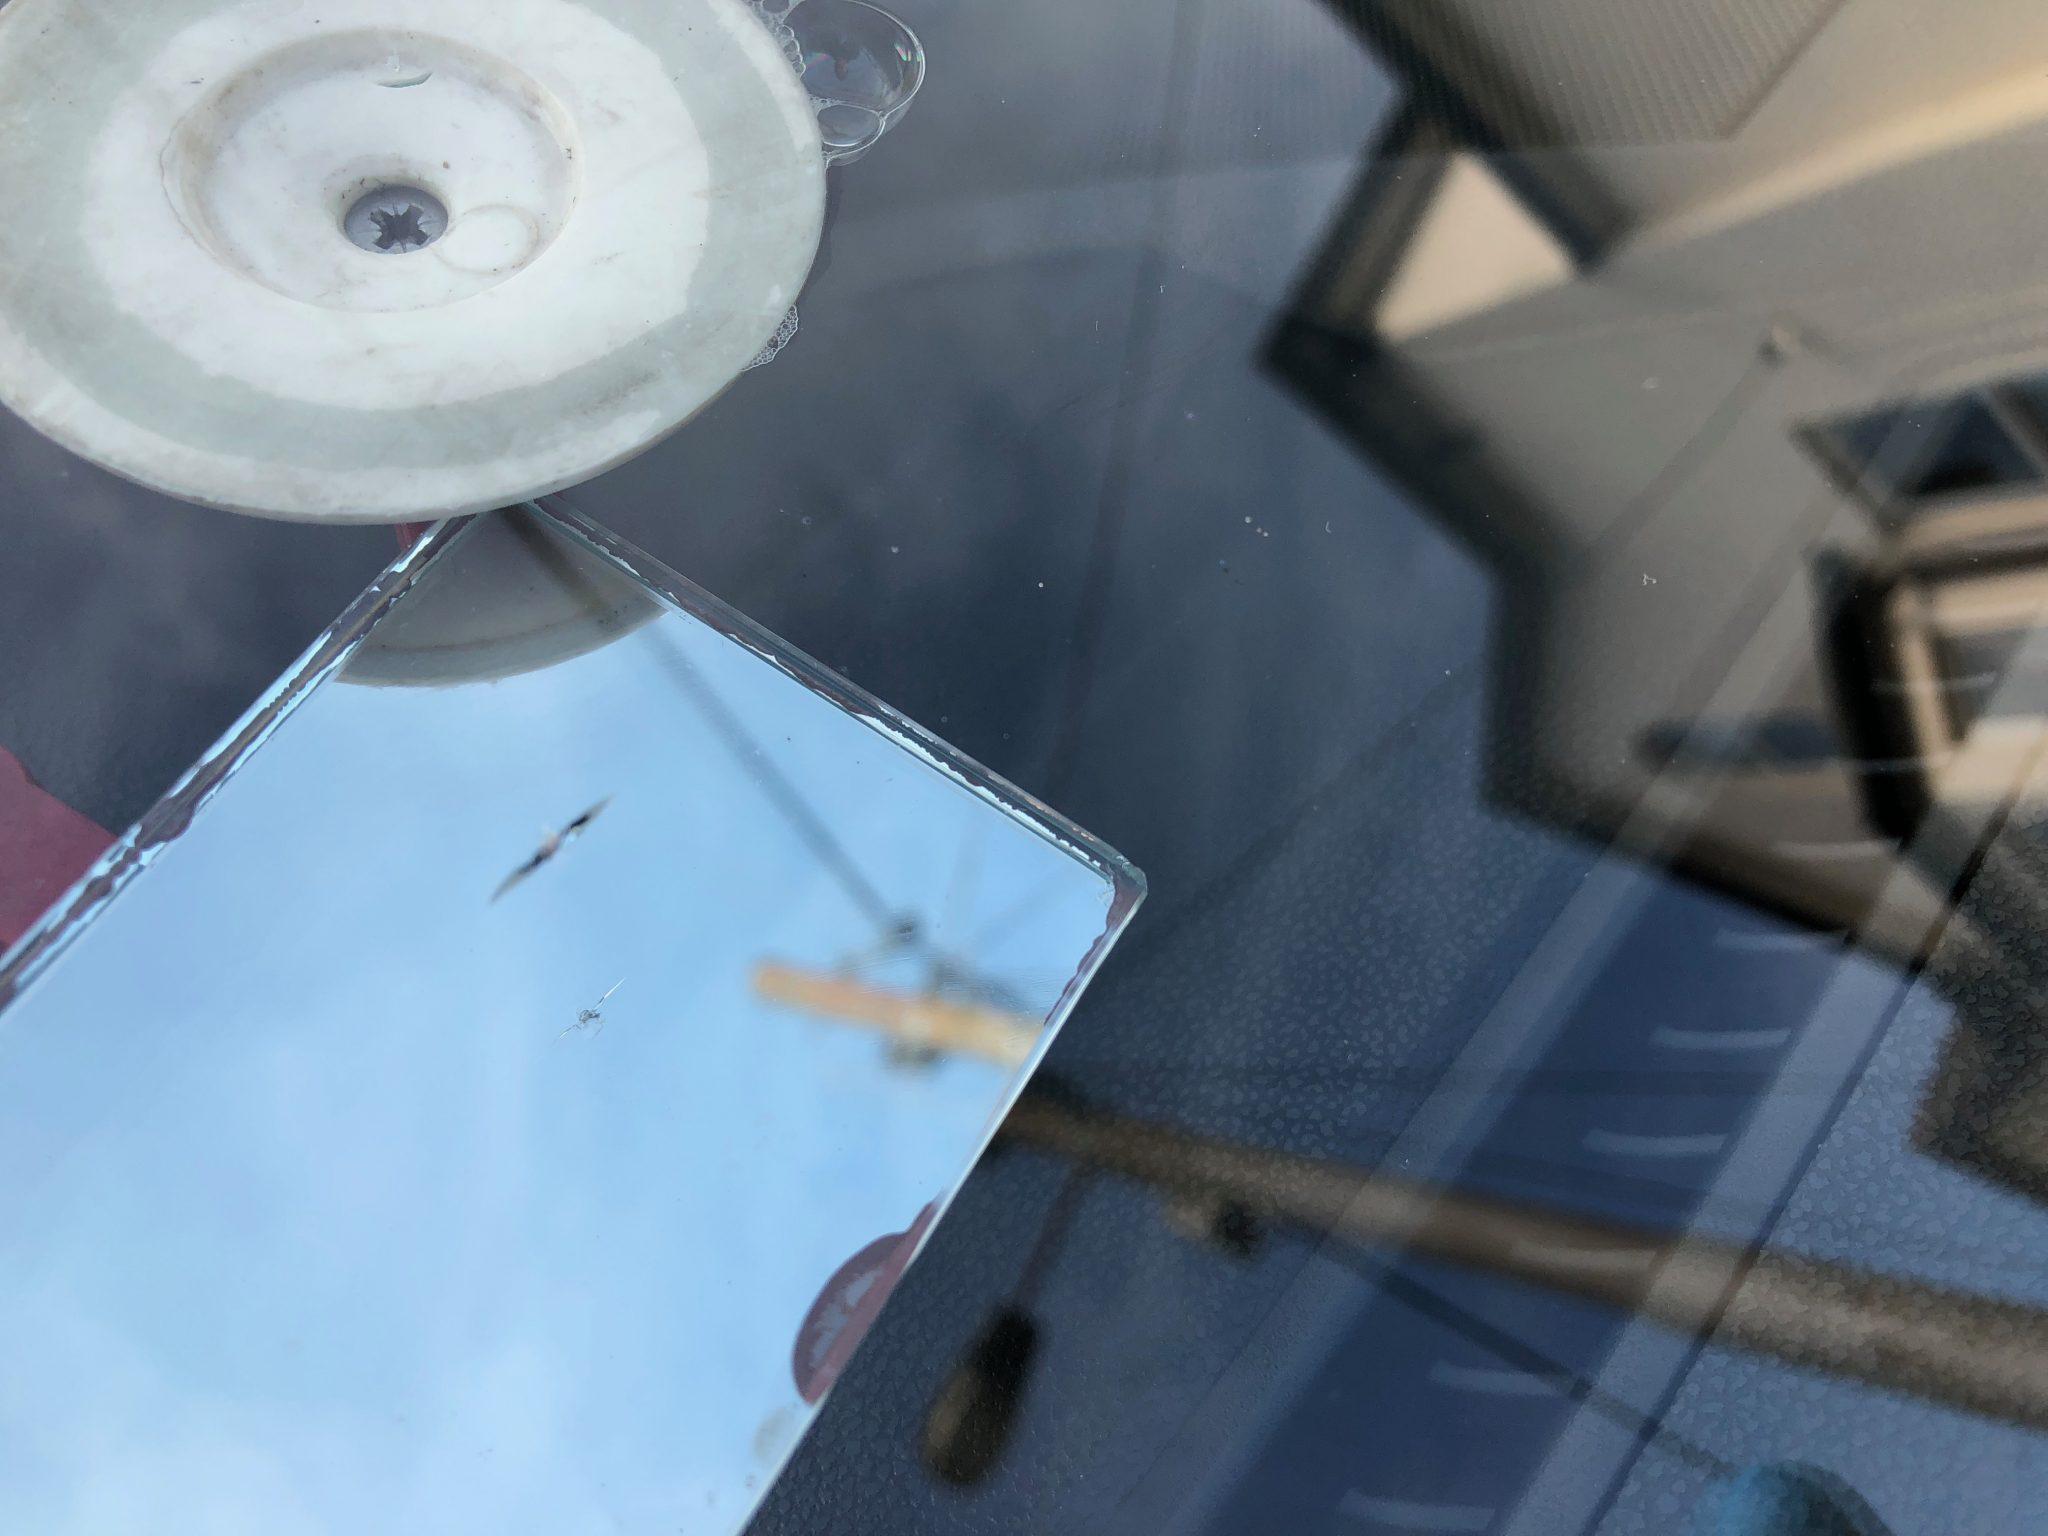 Mercedes A-Class Windscreen Chip Repair